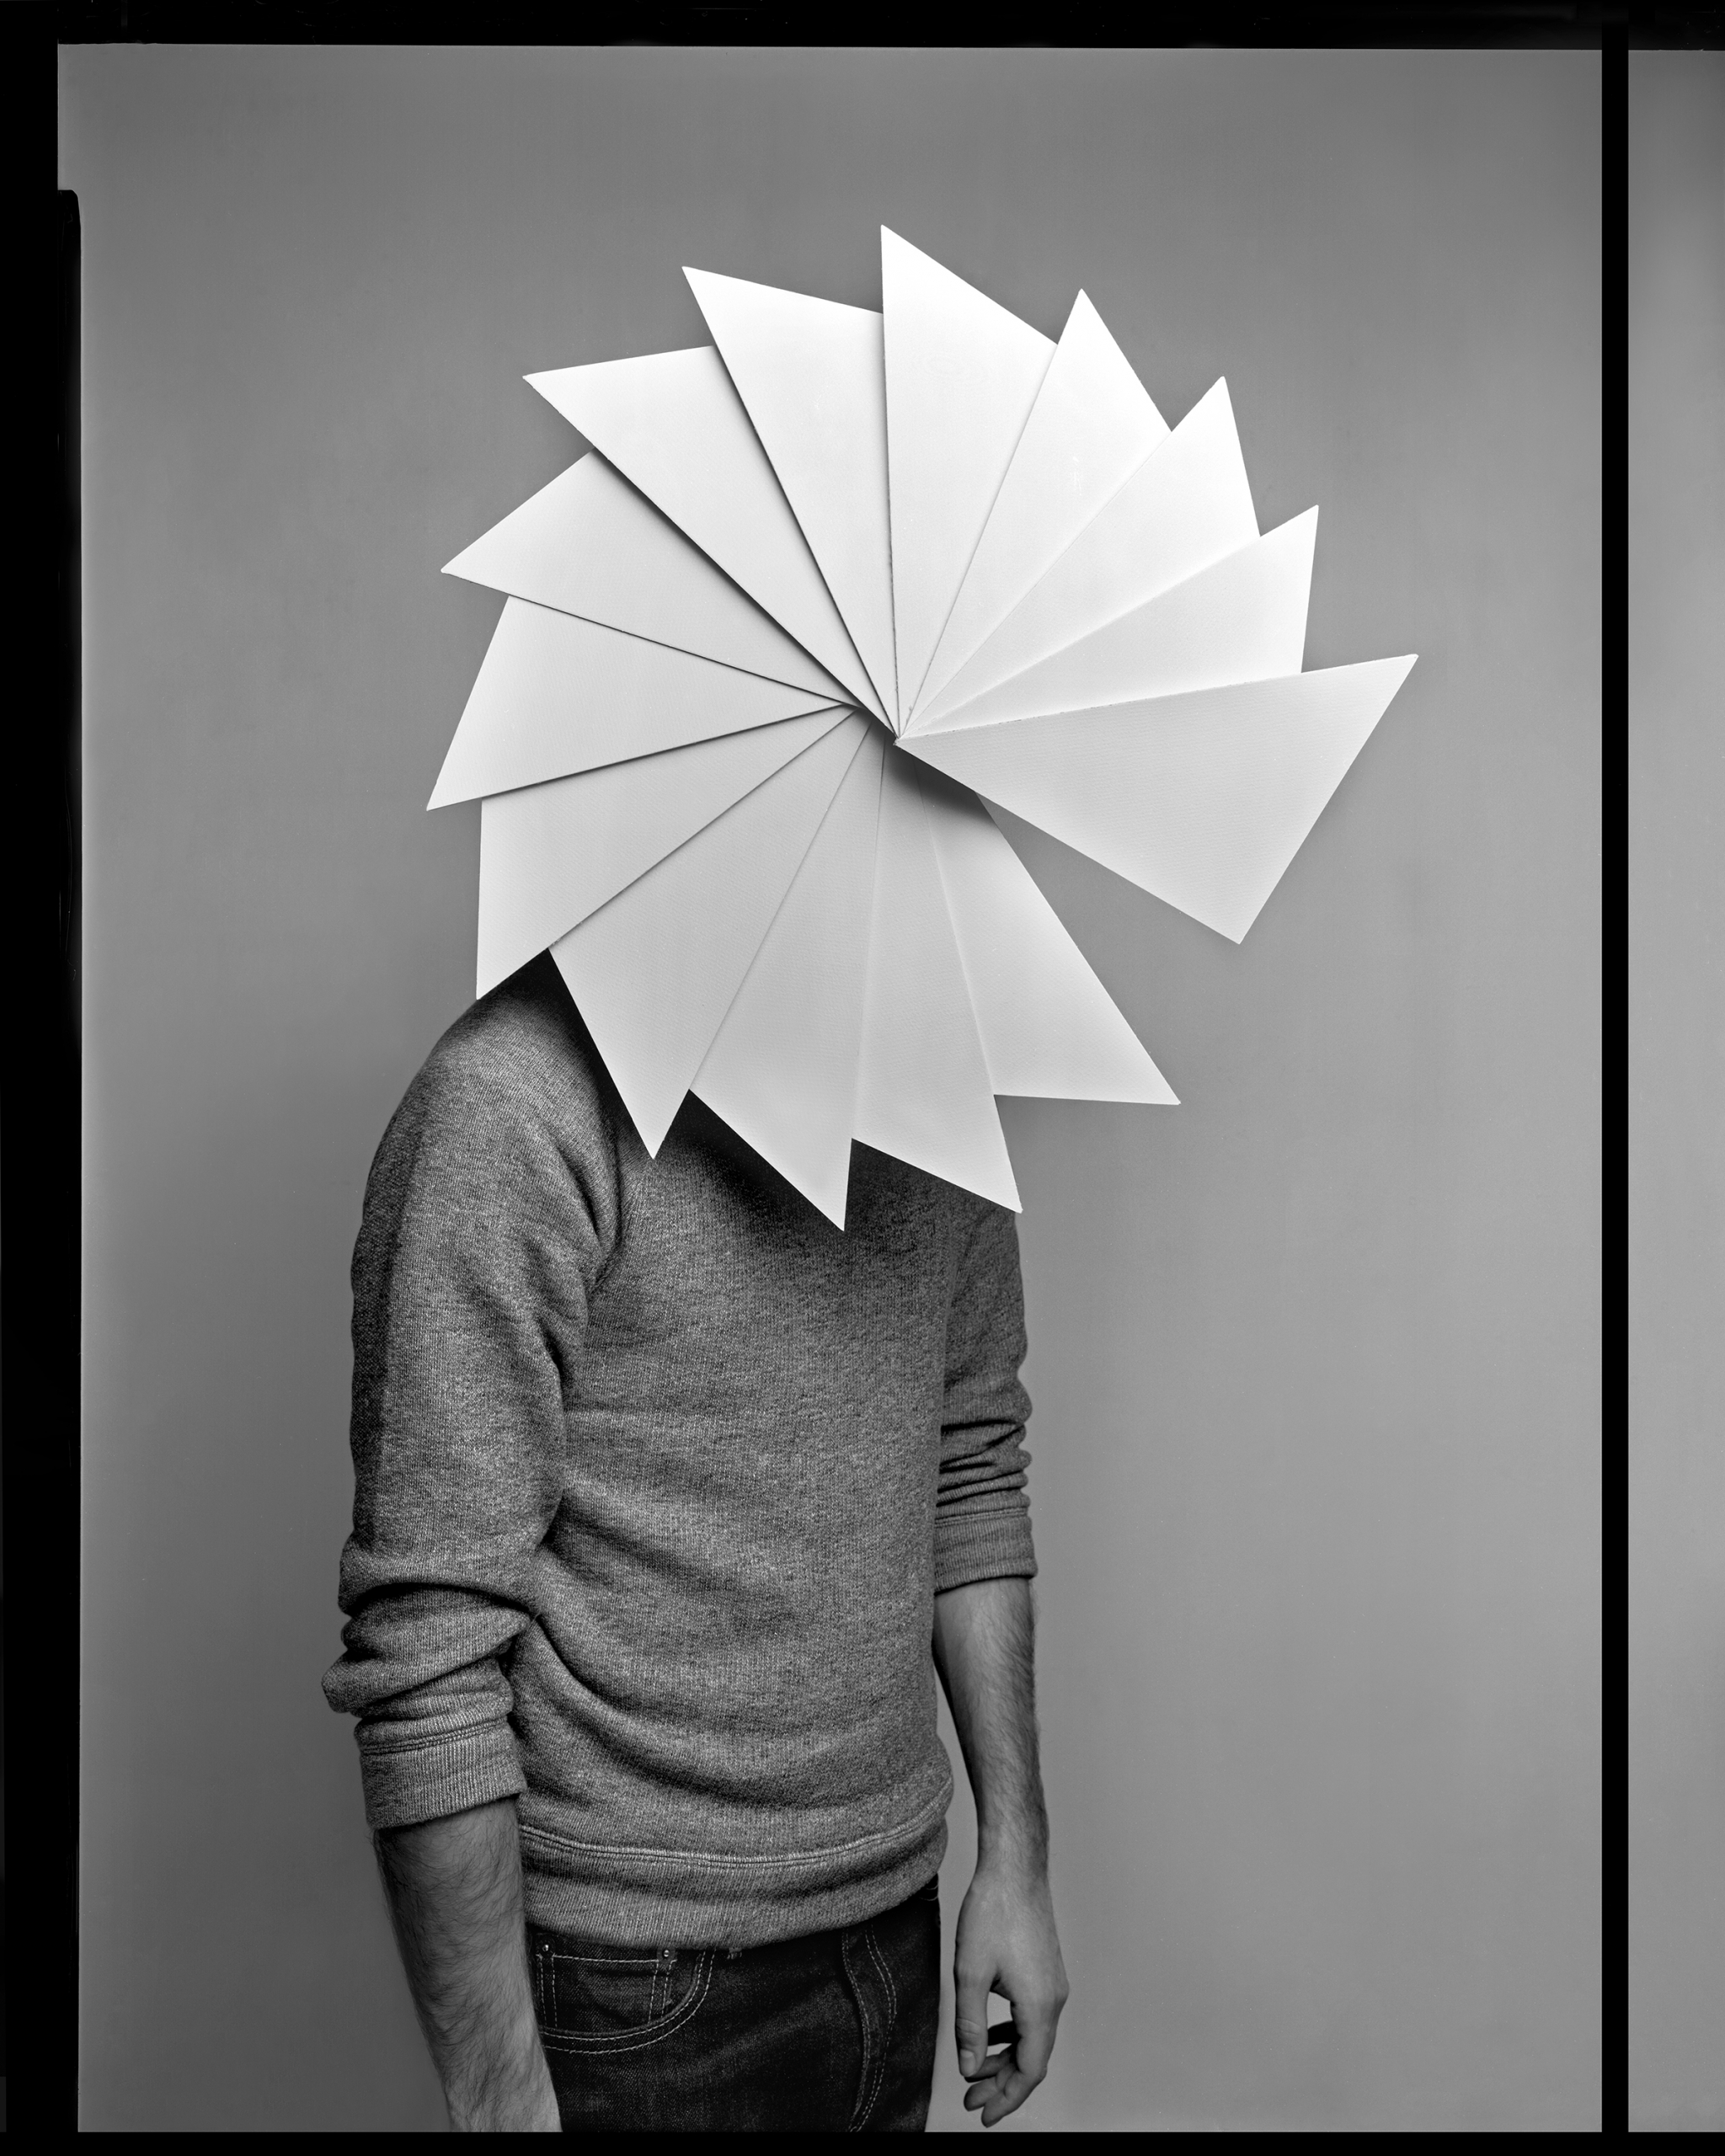 Neeko Paluzzi, Self-portrait, 2016